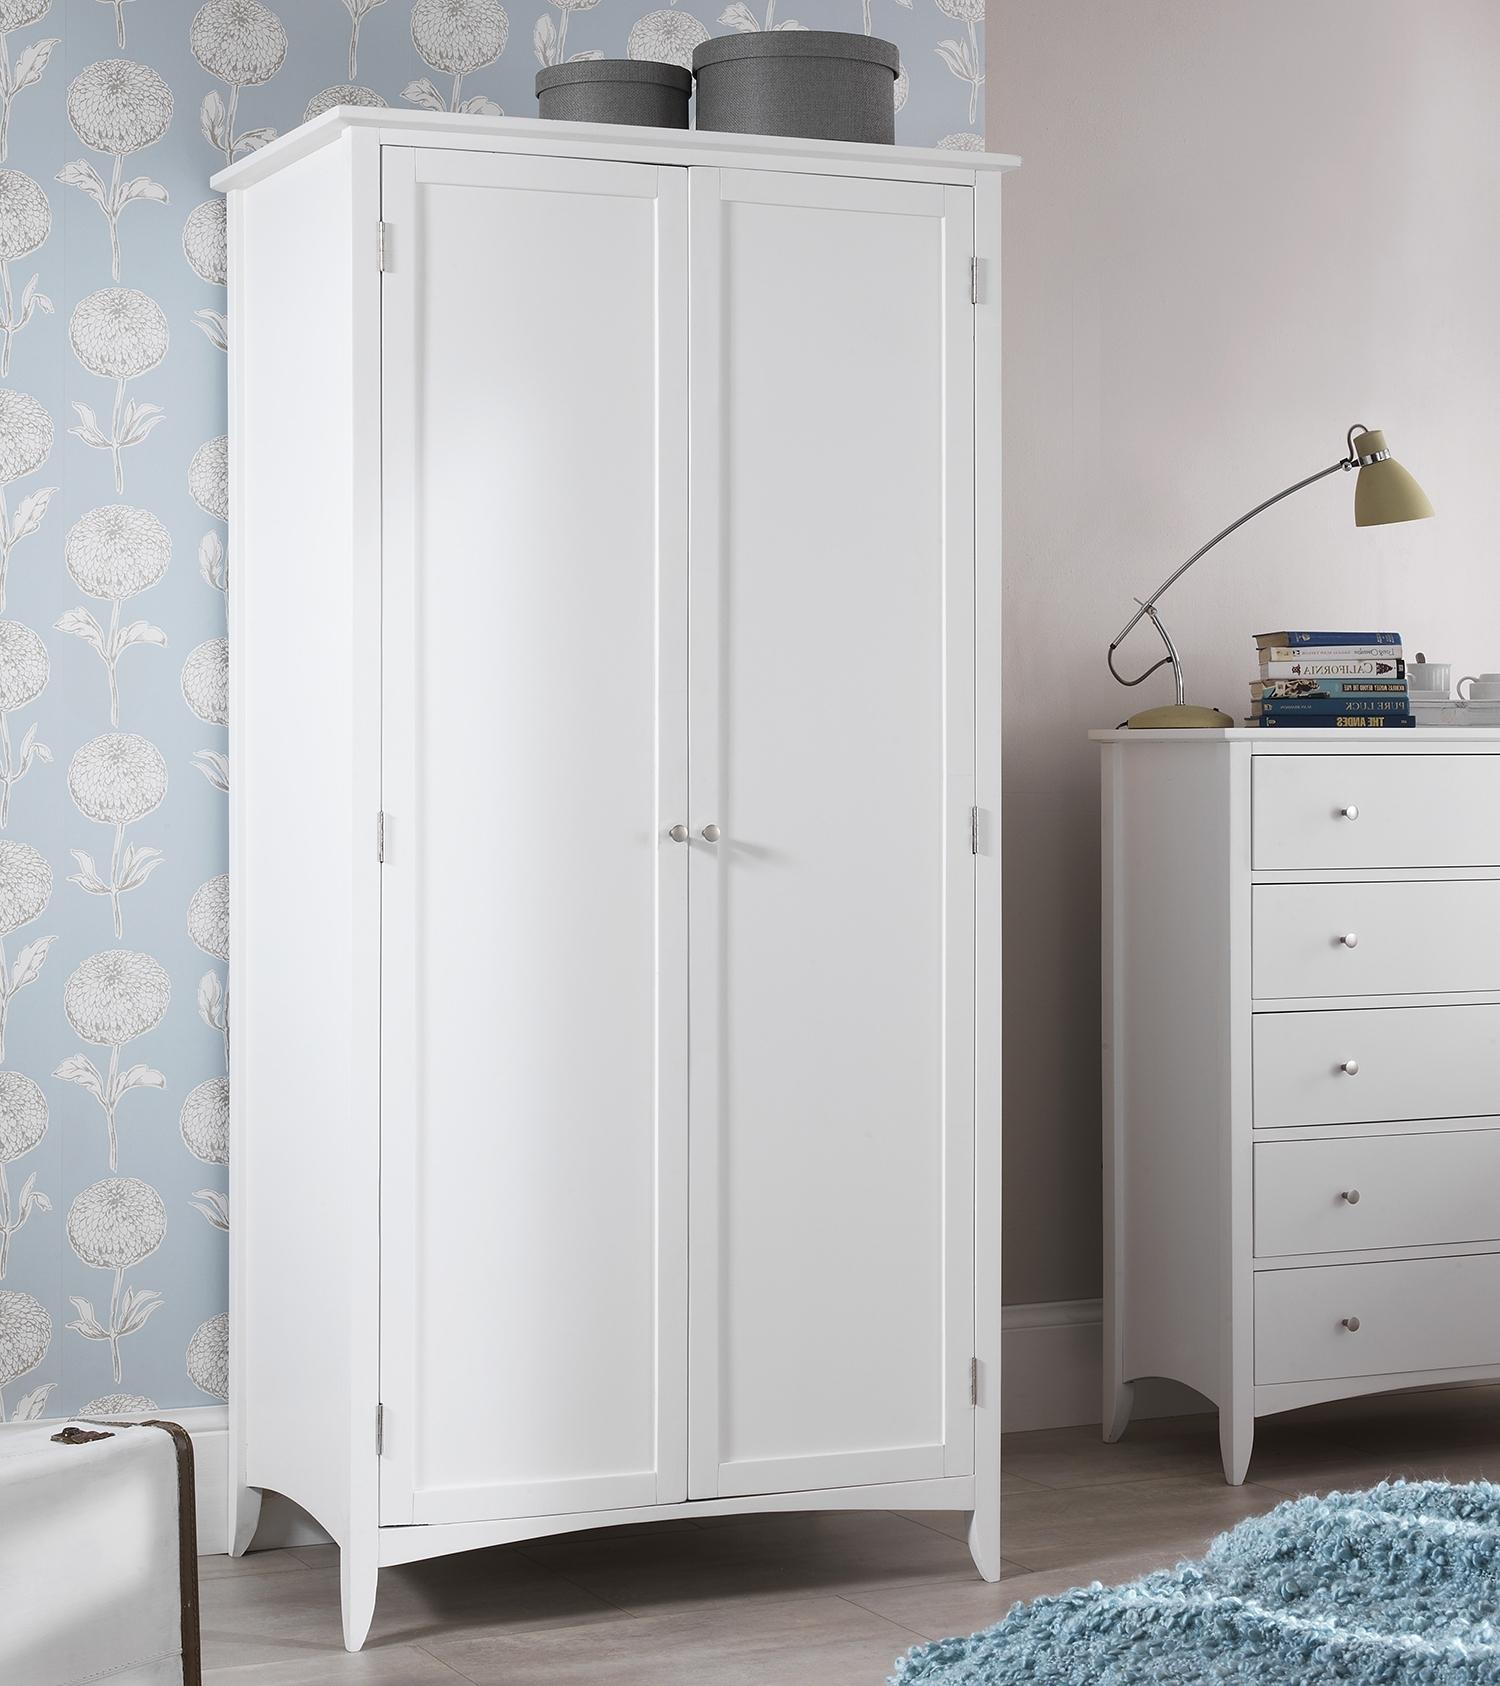 Edward Hopper White Double Wardrobe, Quality Large Wardrobe, Shelf For Current White Double Wardrobes (View 4 of 15)